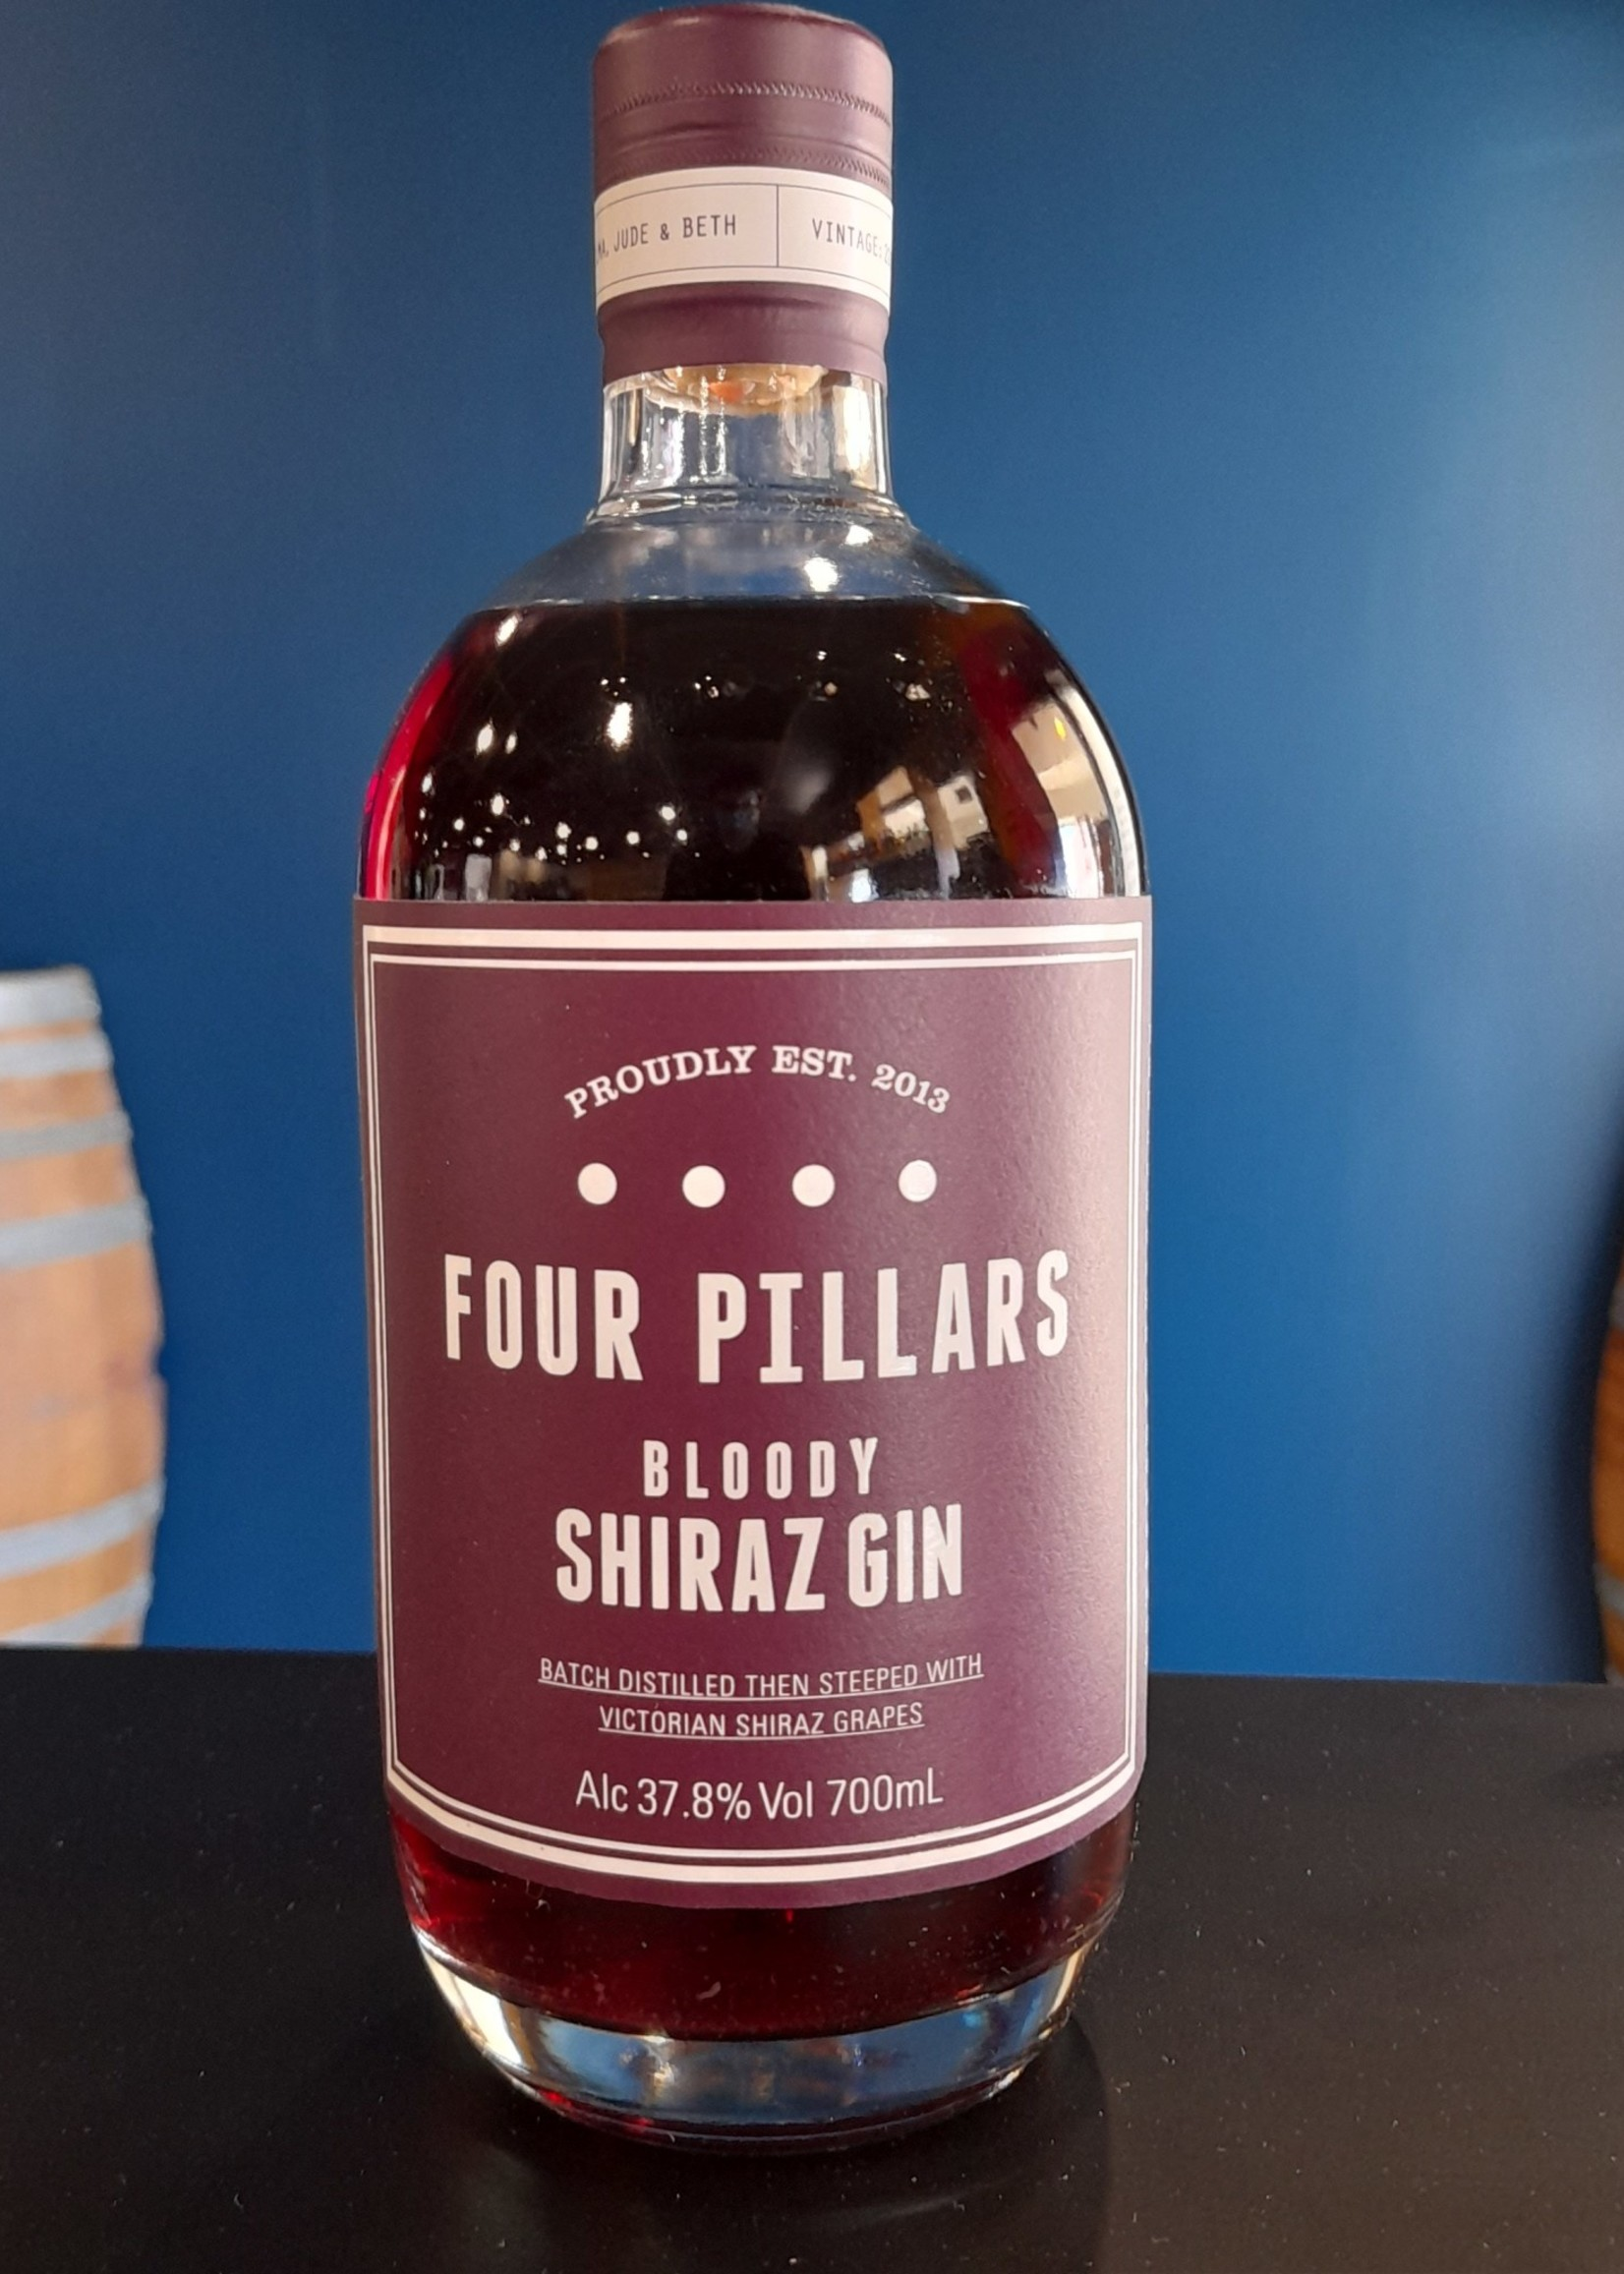 Four Pillars Four Pillars Bloody Shiraz Gin